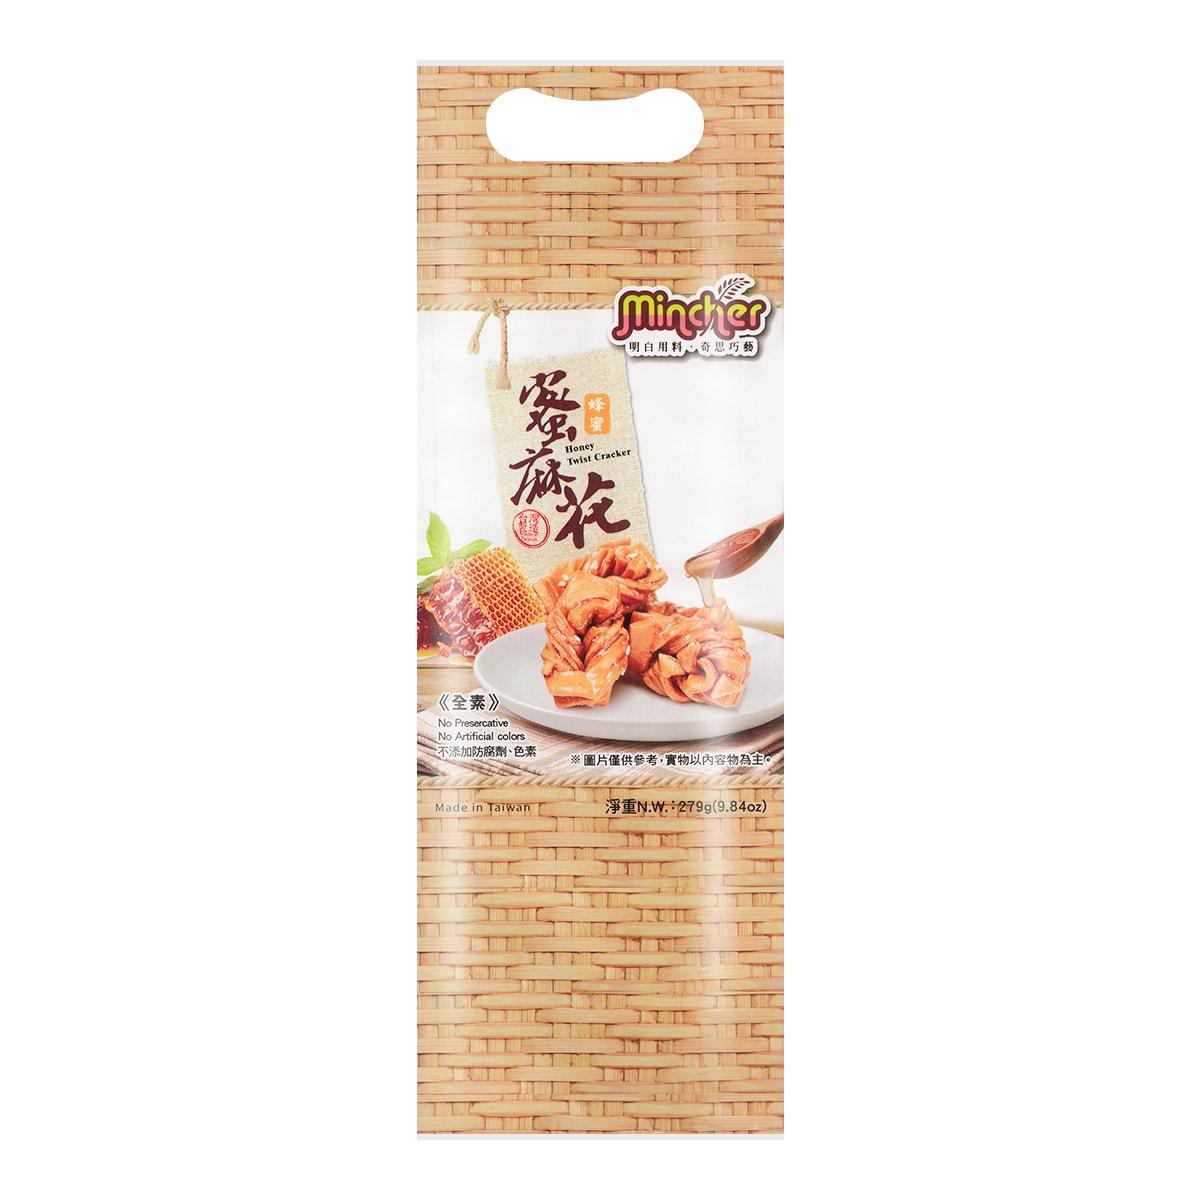 MINCHER Dough Twist - Honey  279g